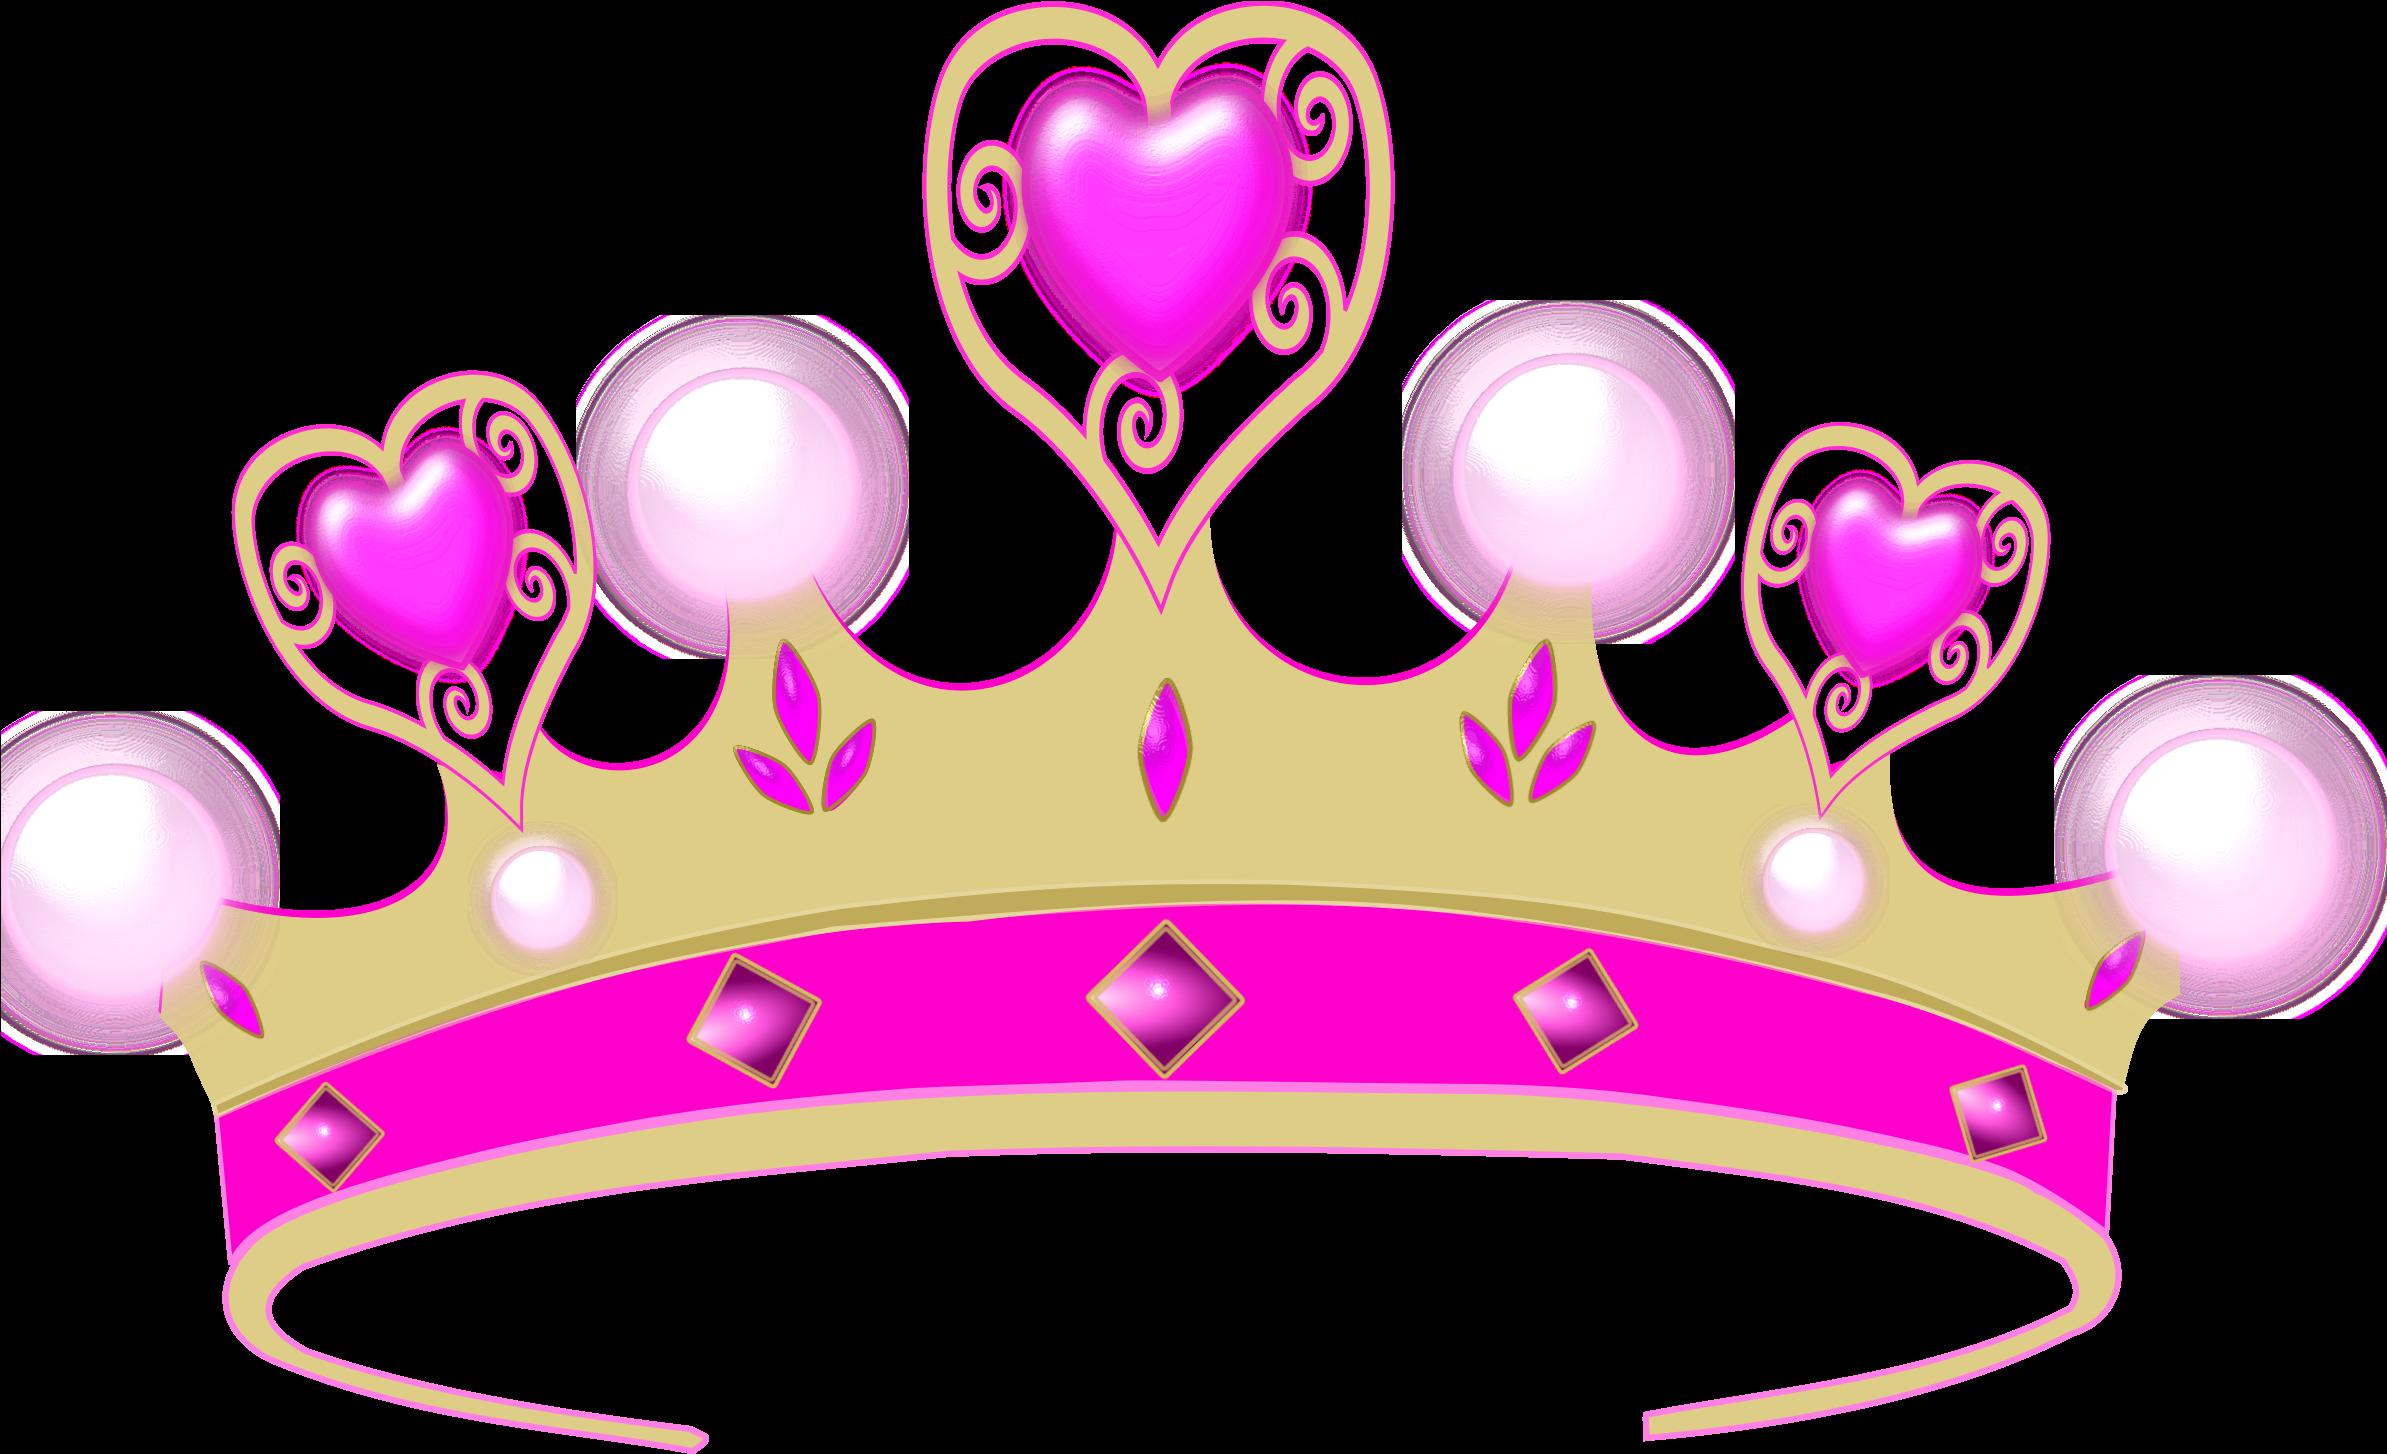 заказа корона разноцветная картинки две